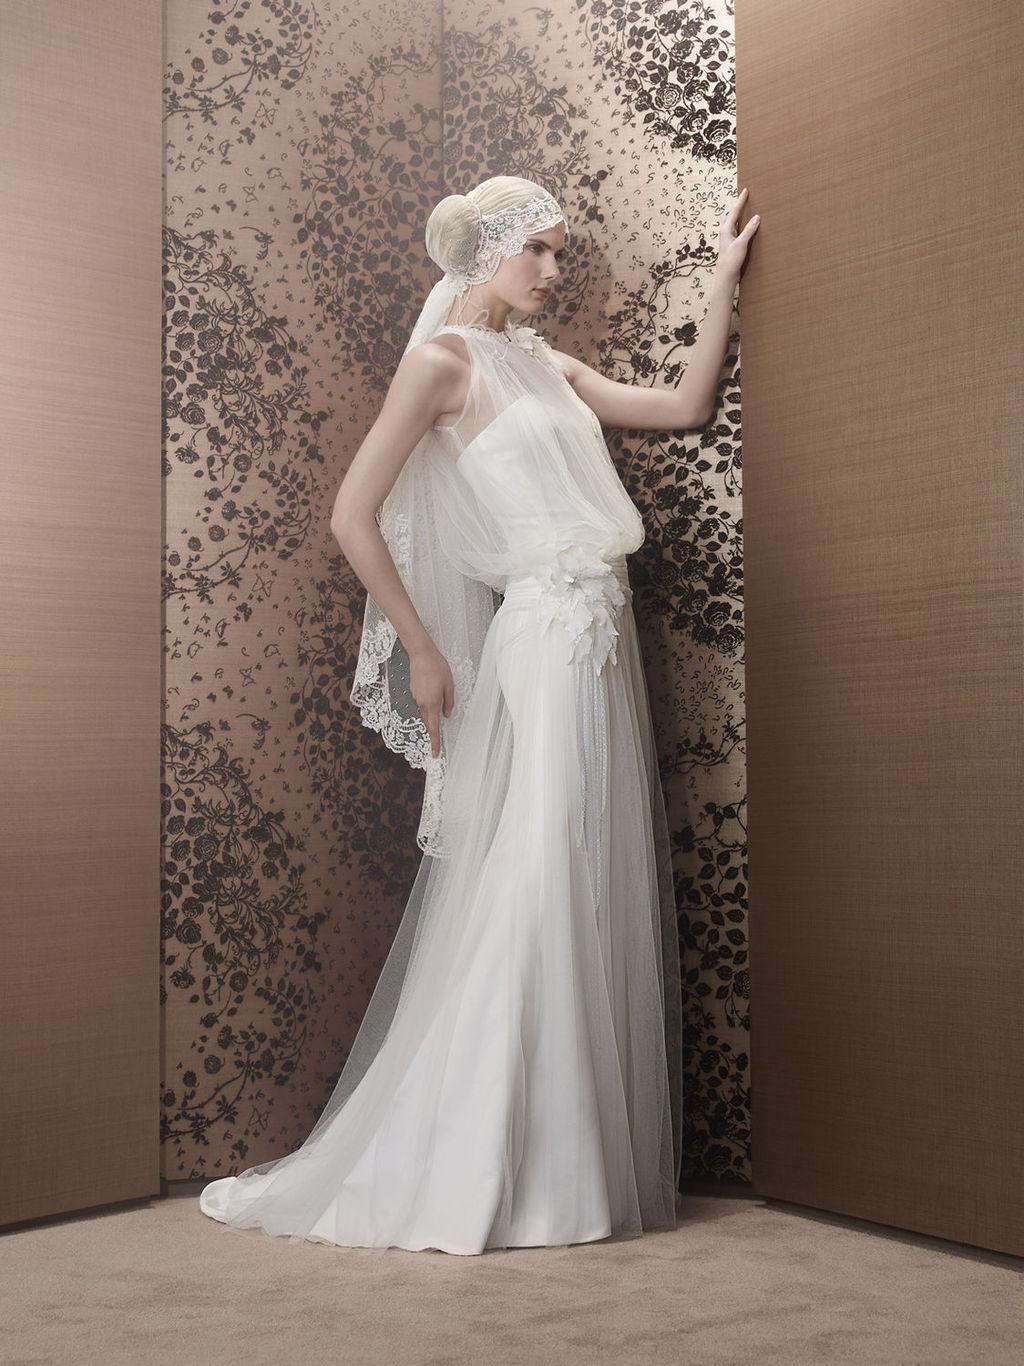 Romantic-2013-wedding-dress-sheer-halter.full